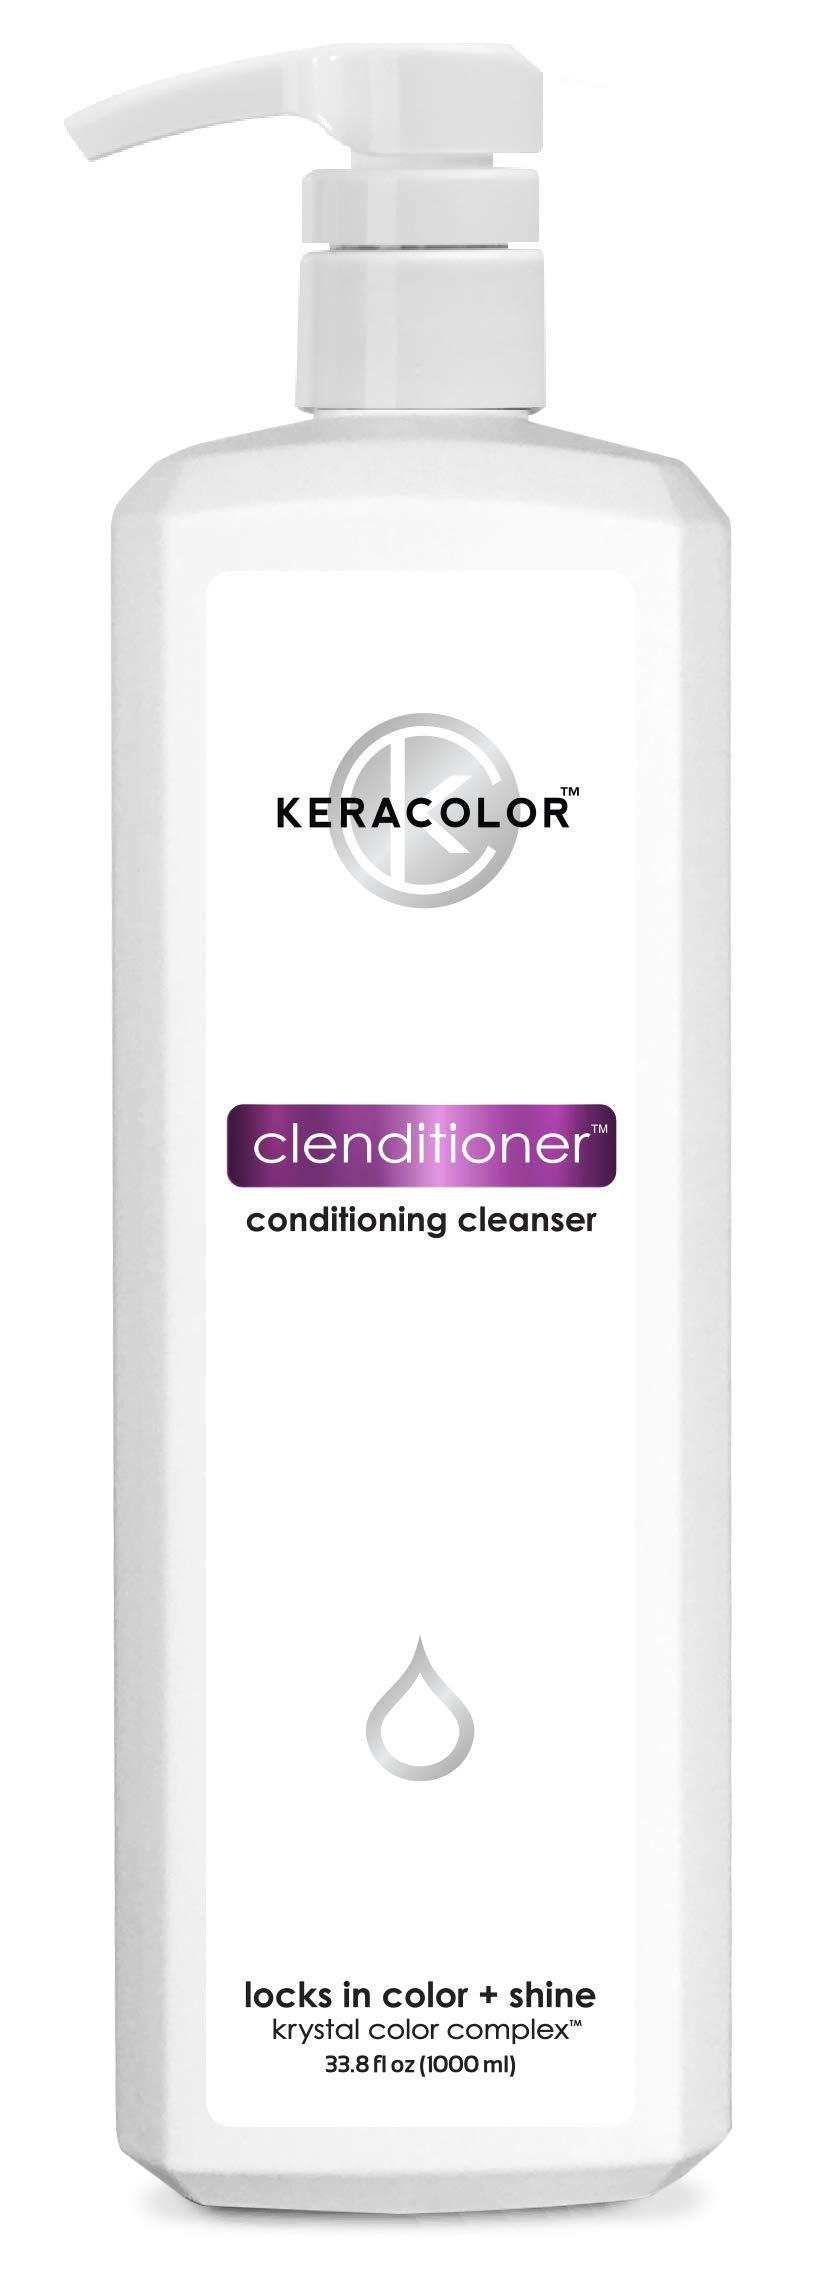 KERACOLOR Clenditioner Cleansing Conditioner, 33 Fl Oz